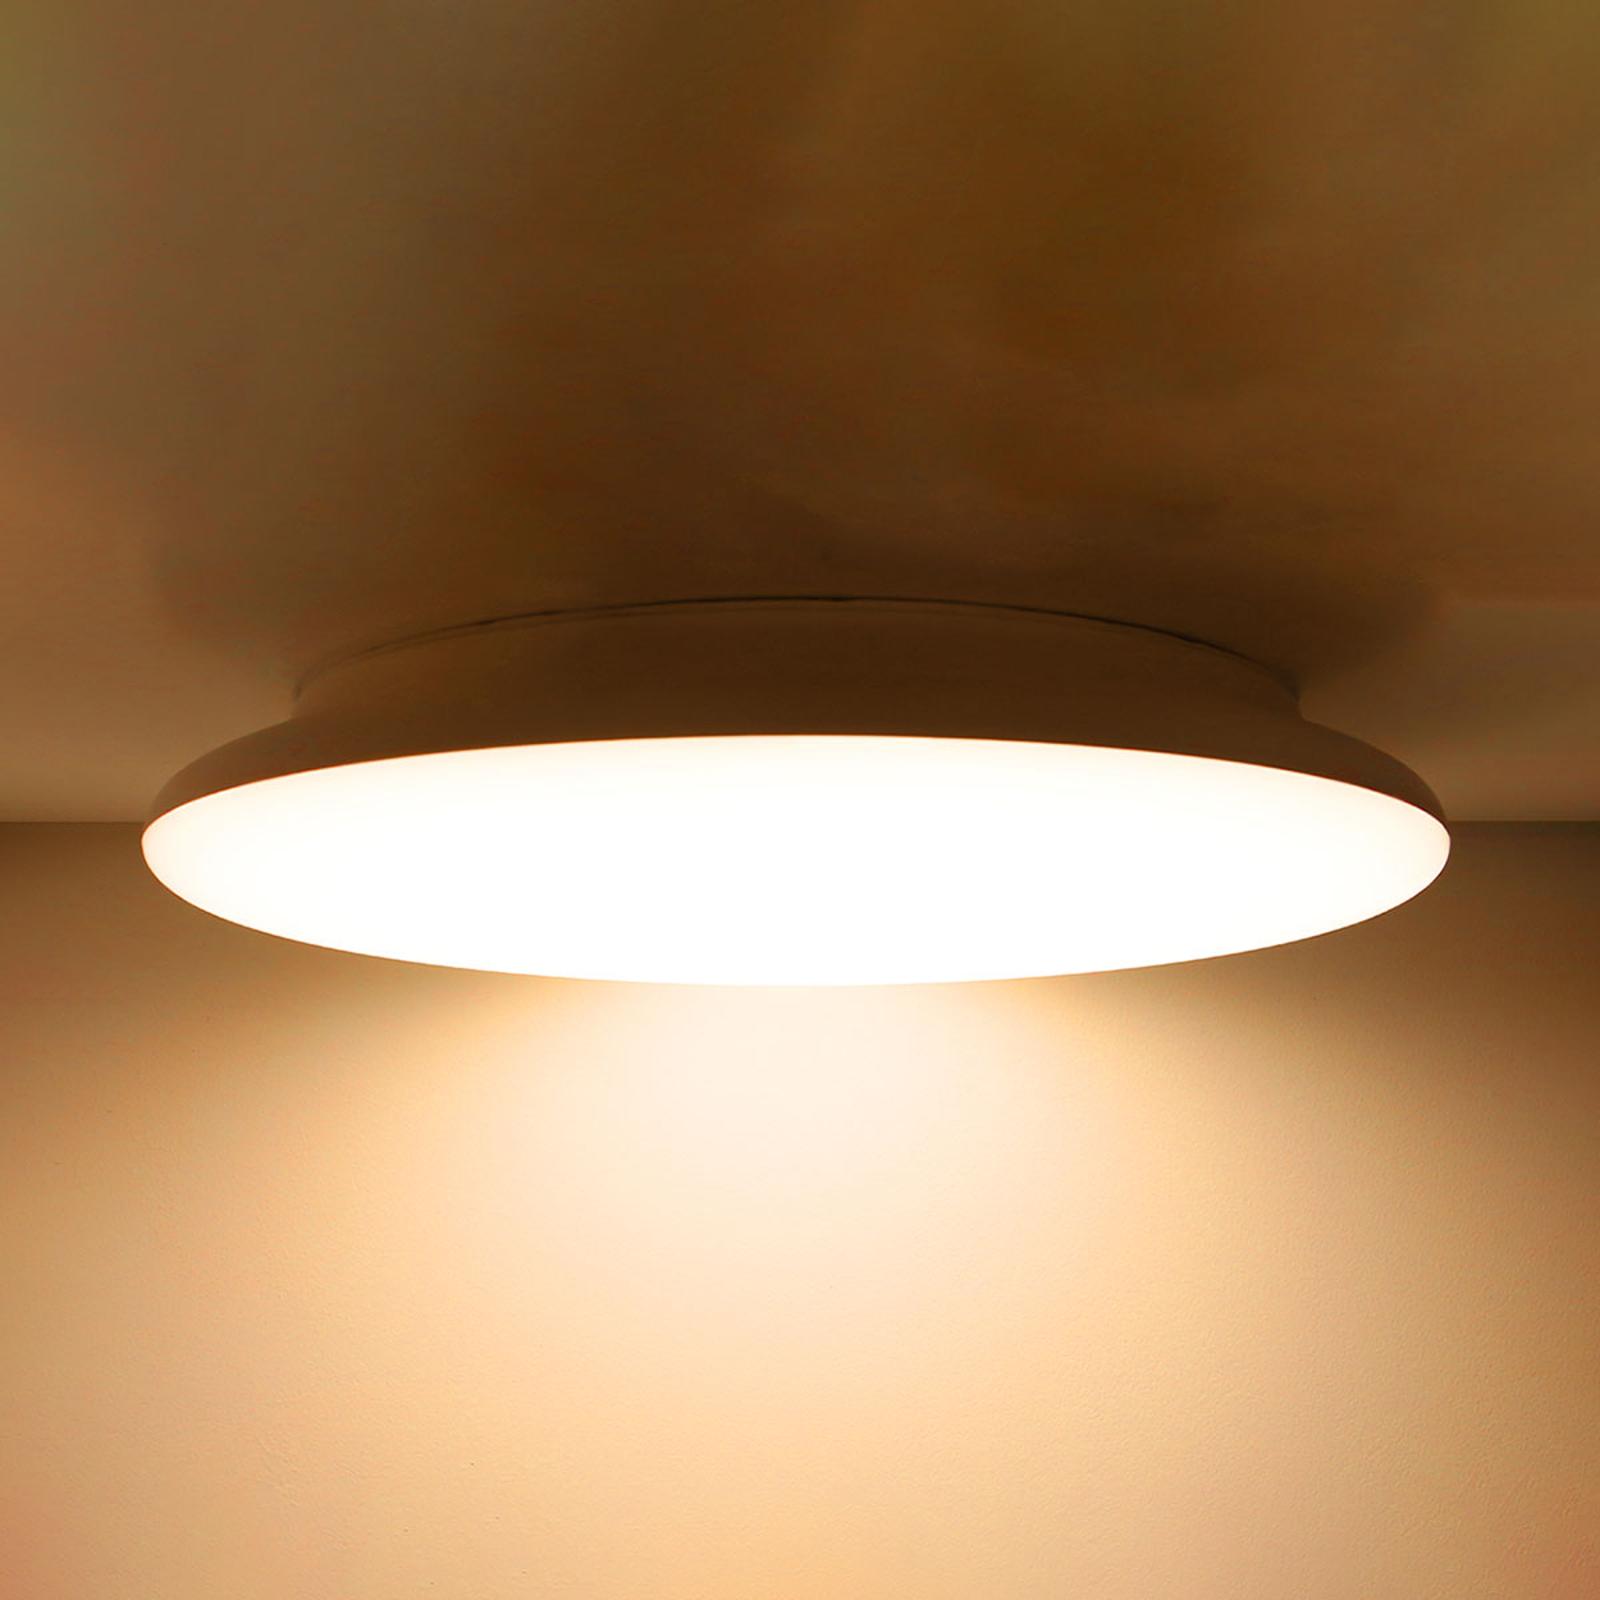 SLC LED plafondlamp dimbaar IP54 Ø 25 cm 2.700K